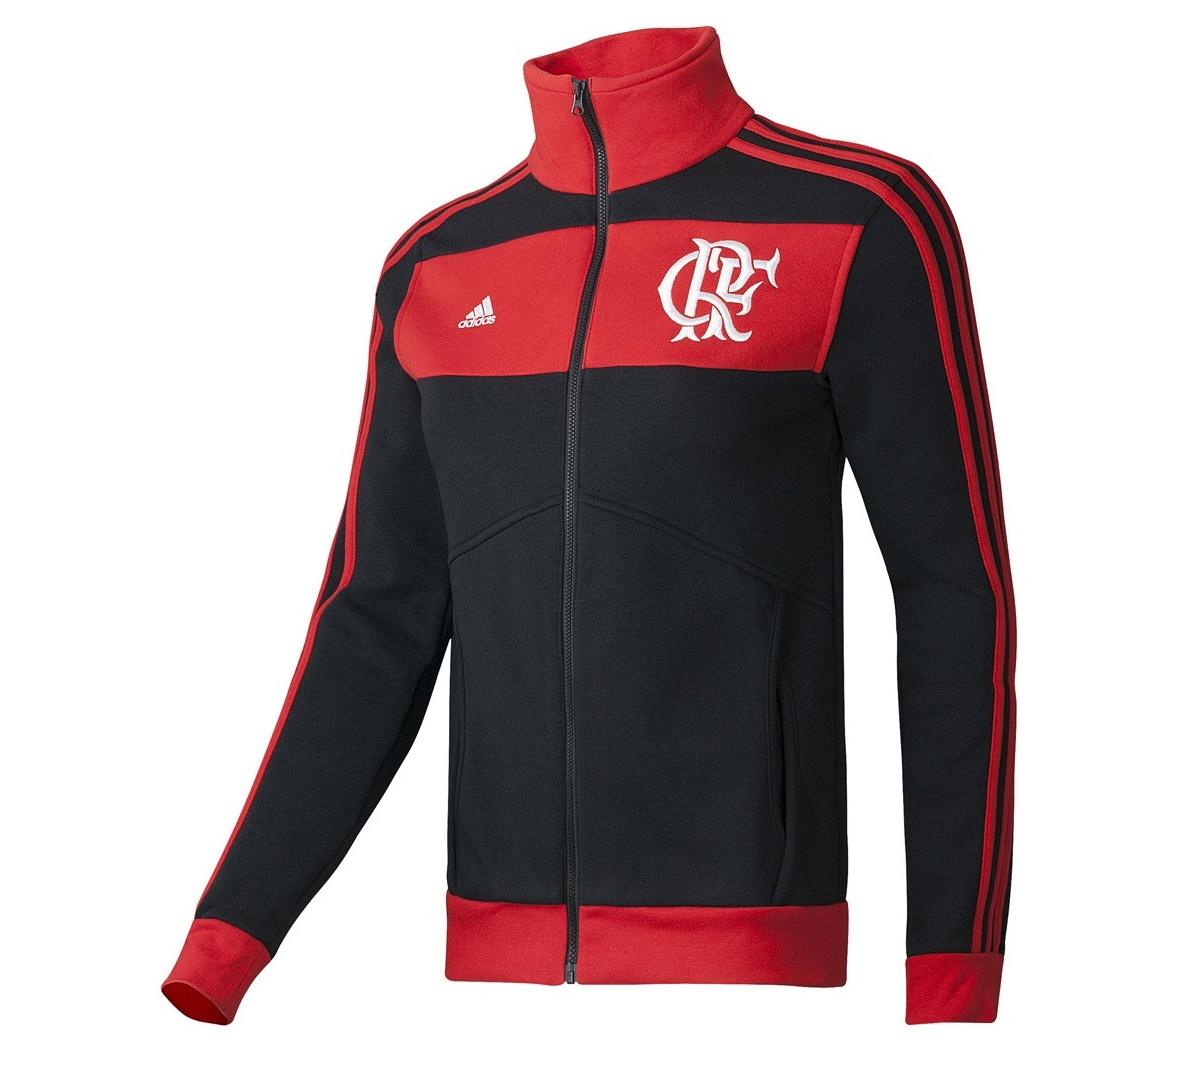 f2a07f814aa95 Jaqueta Flamengo Adidas TRK Top Feminina Jaqueta Flamengo Adidas TRK Top  Feminina ...